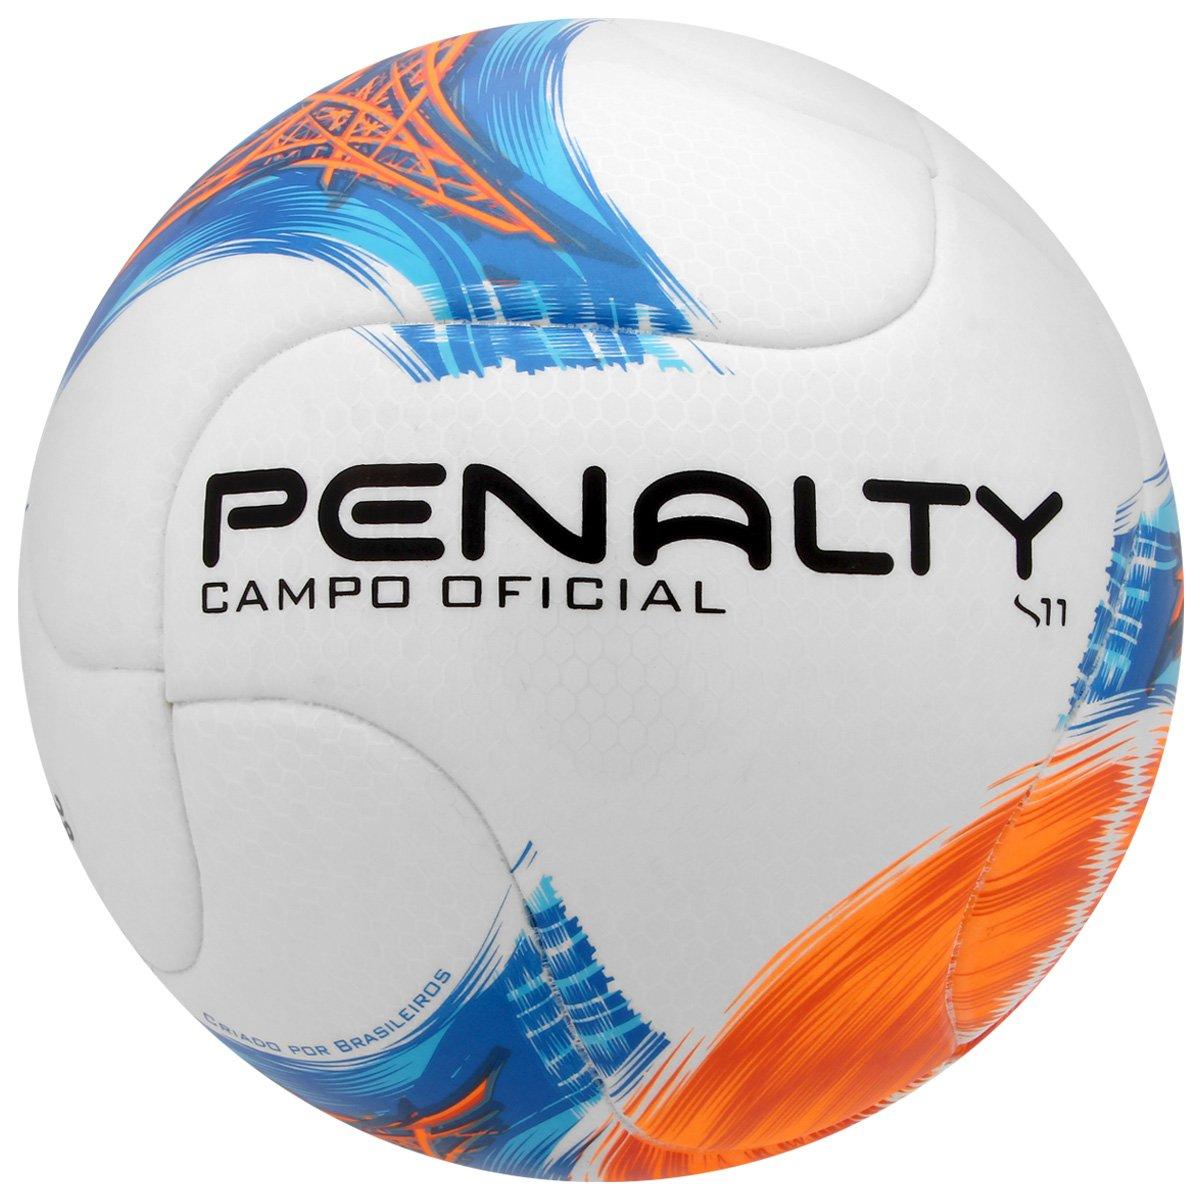 Bola Futebol Penalty S11 R1 4 Campo - Compre Agora  619a69ed60270